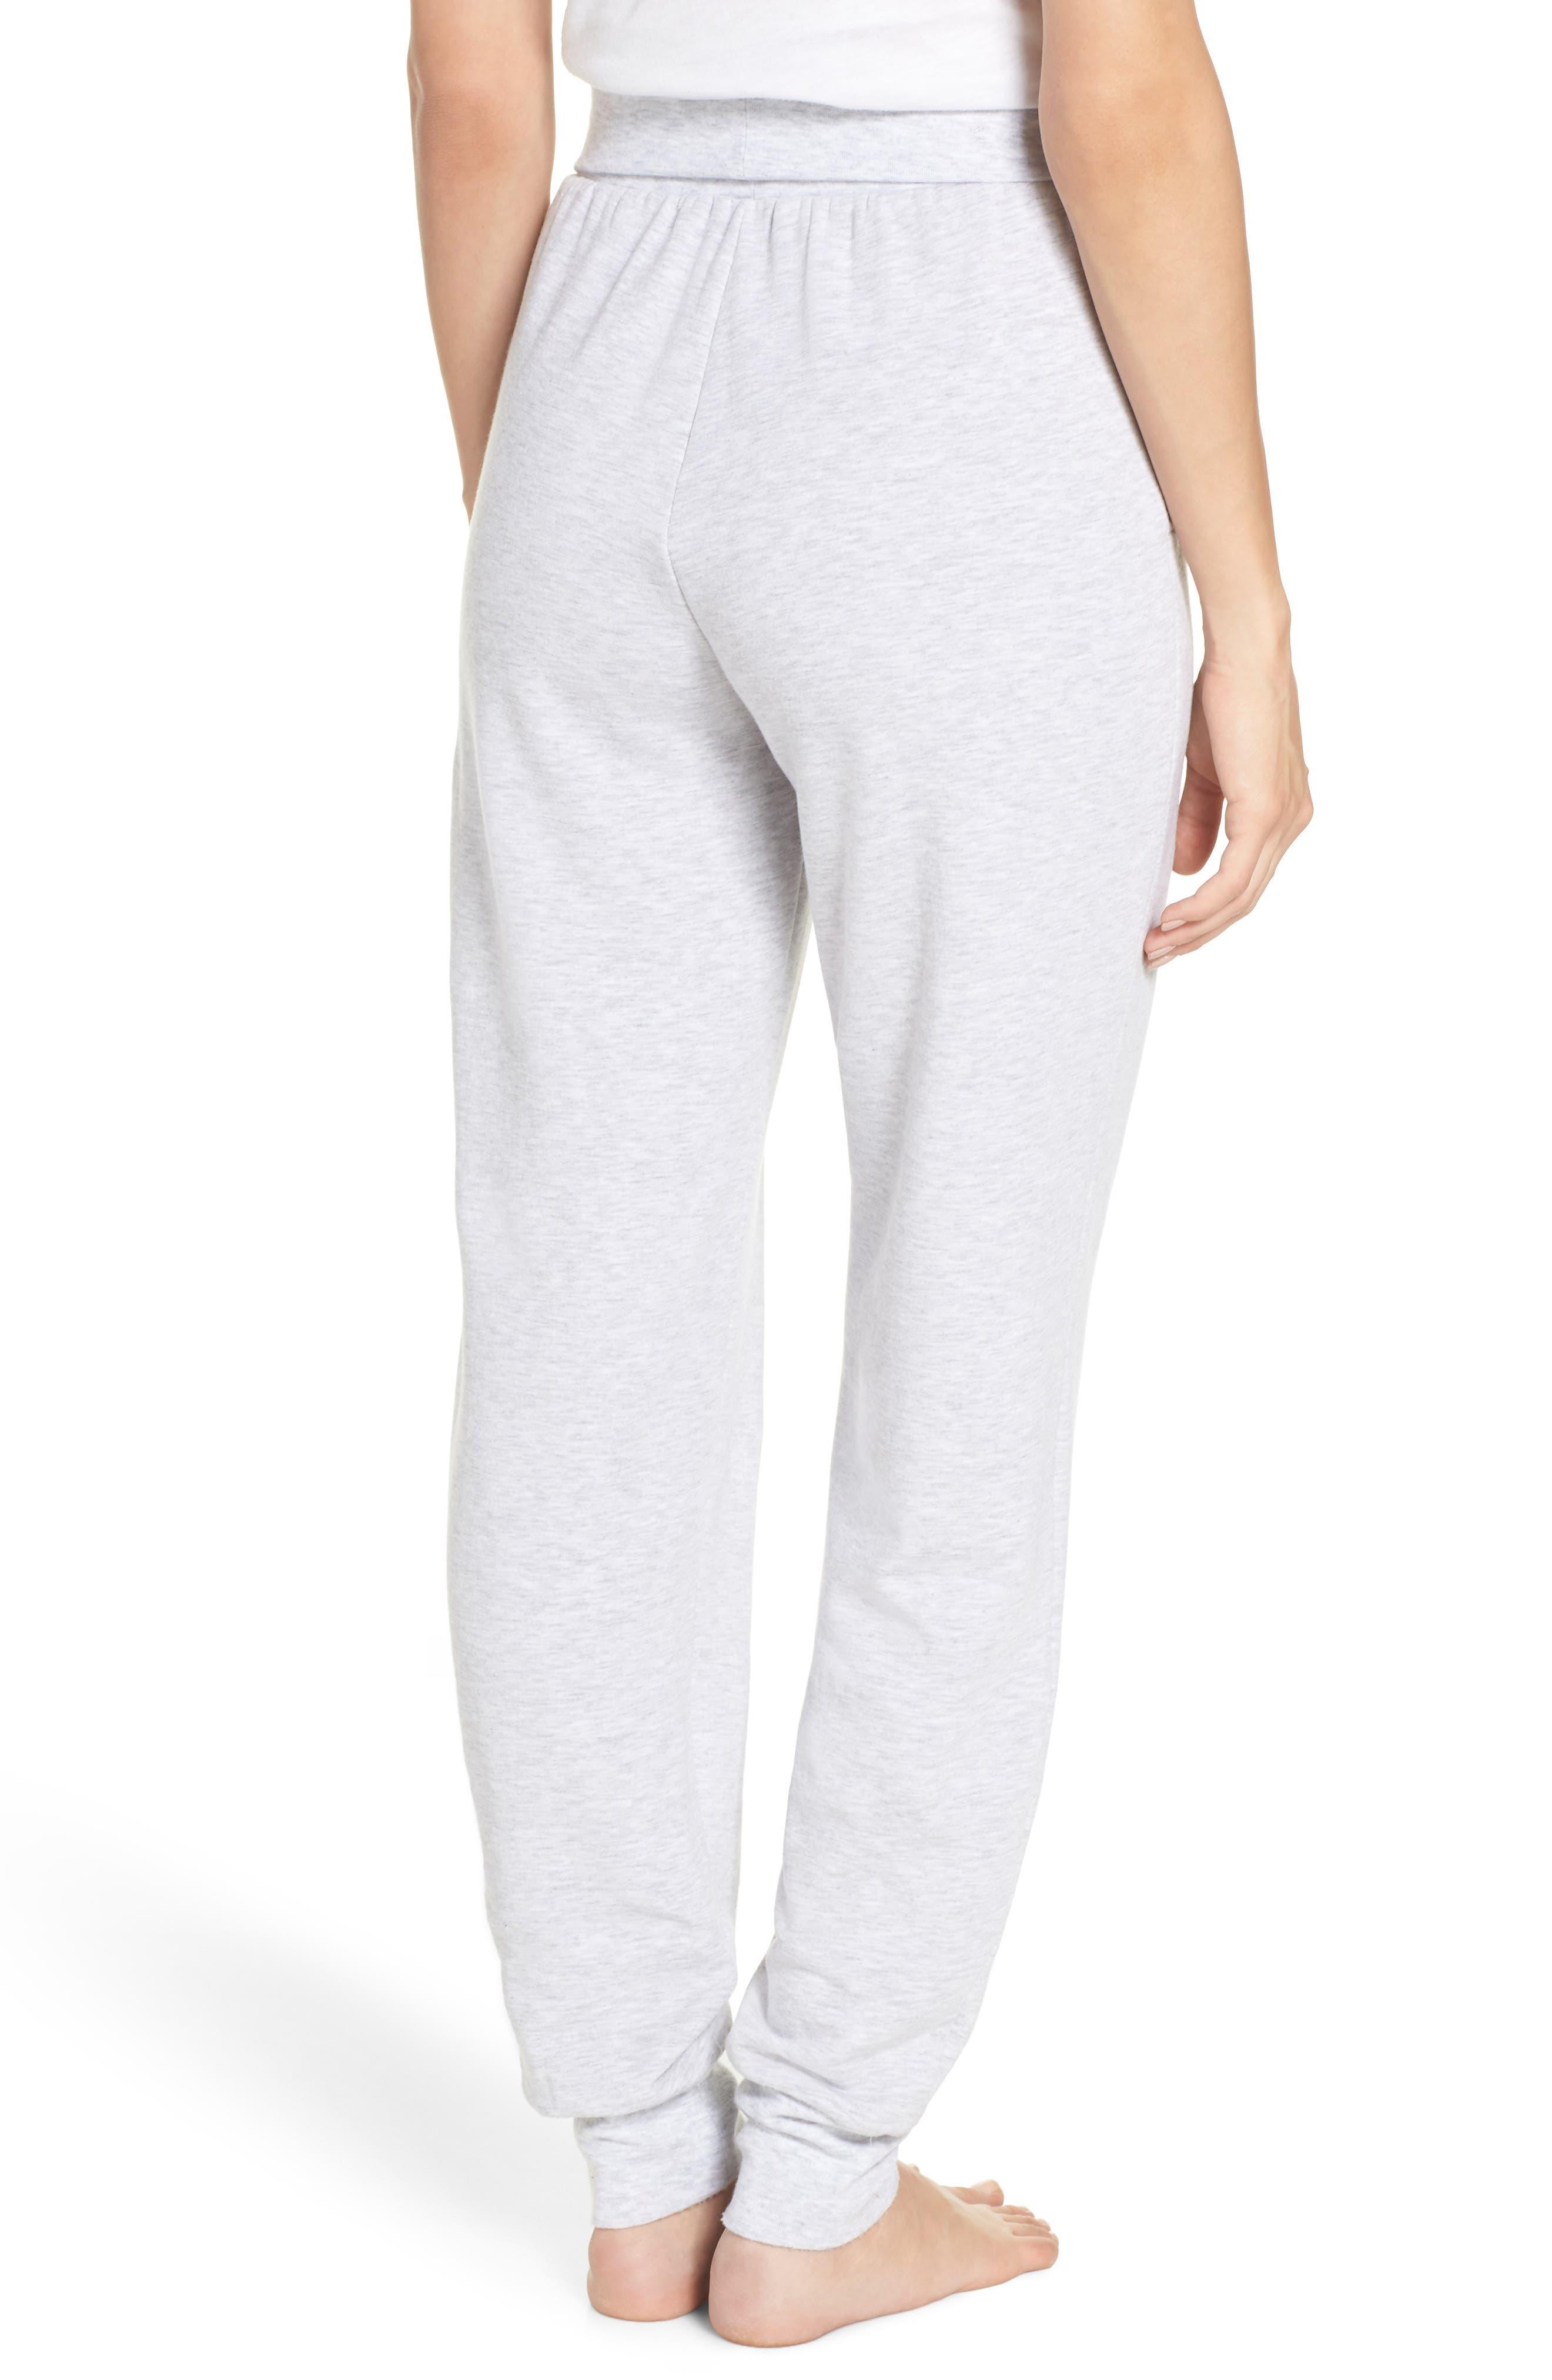 Jogger Pajama Pants,                             Alternate thumbnail 2, color,                             020